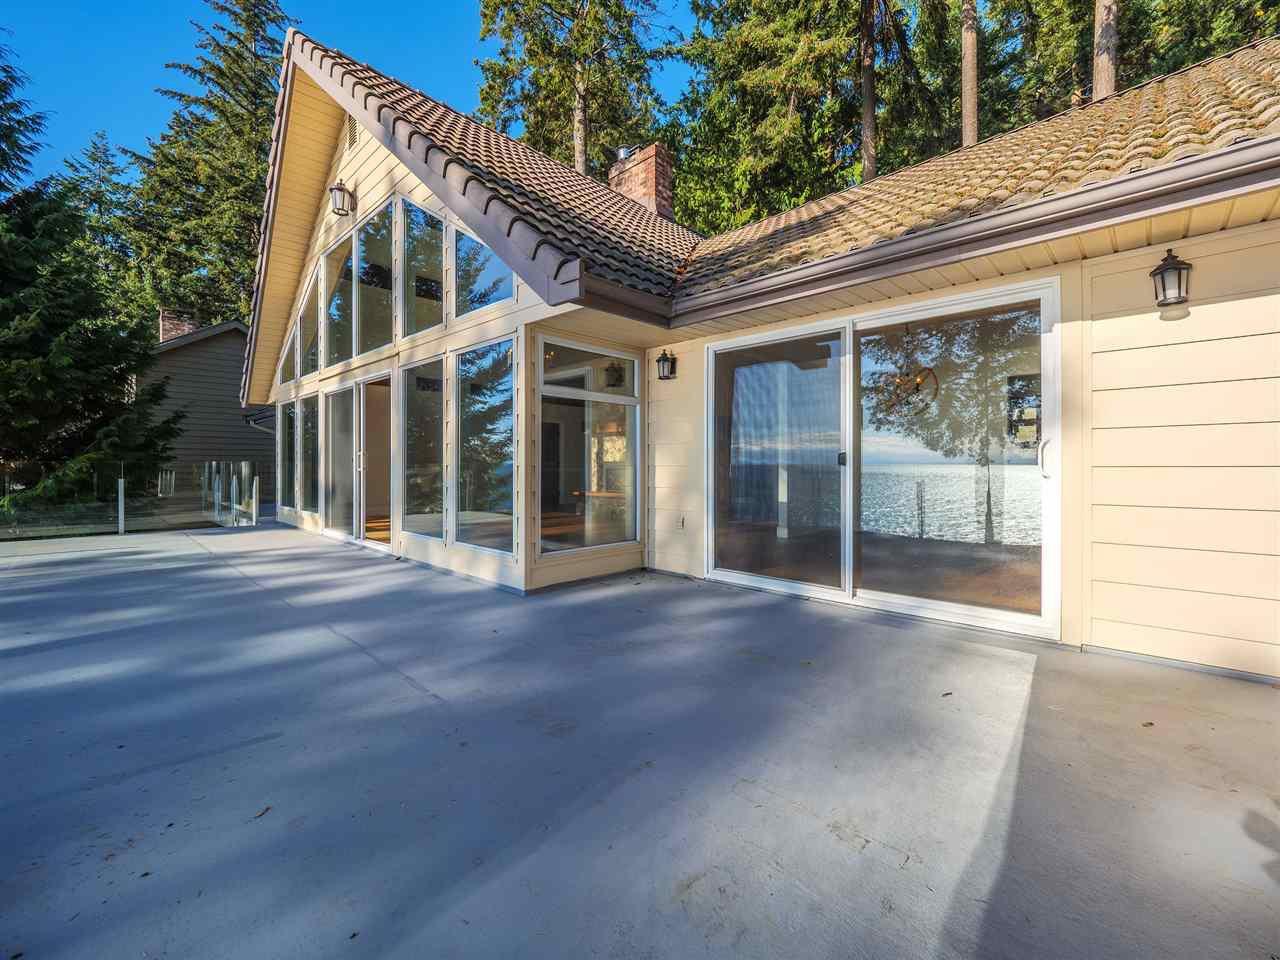 "Photo 7: Photos: 7101 DALE Road in Sechelt: Sechelt District House for sale in ""Caleda Estates"" (Sunshine Coast)  : MLS®# R2515160"